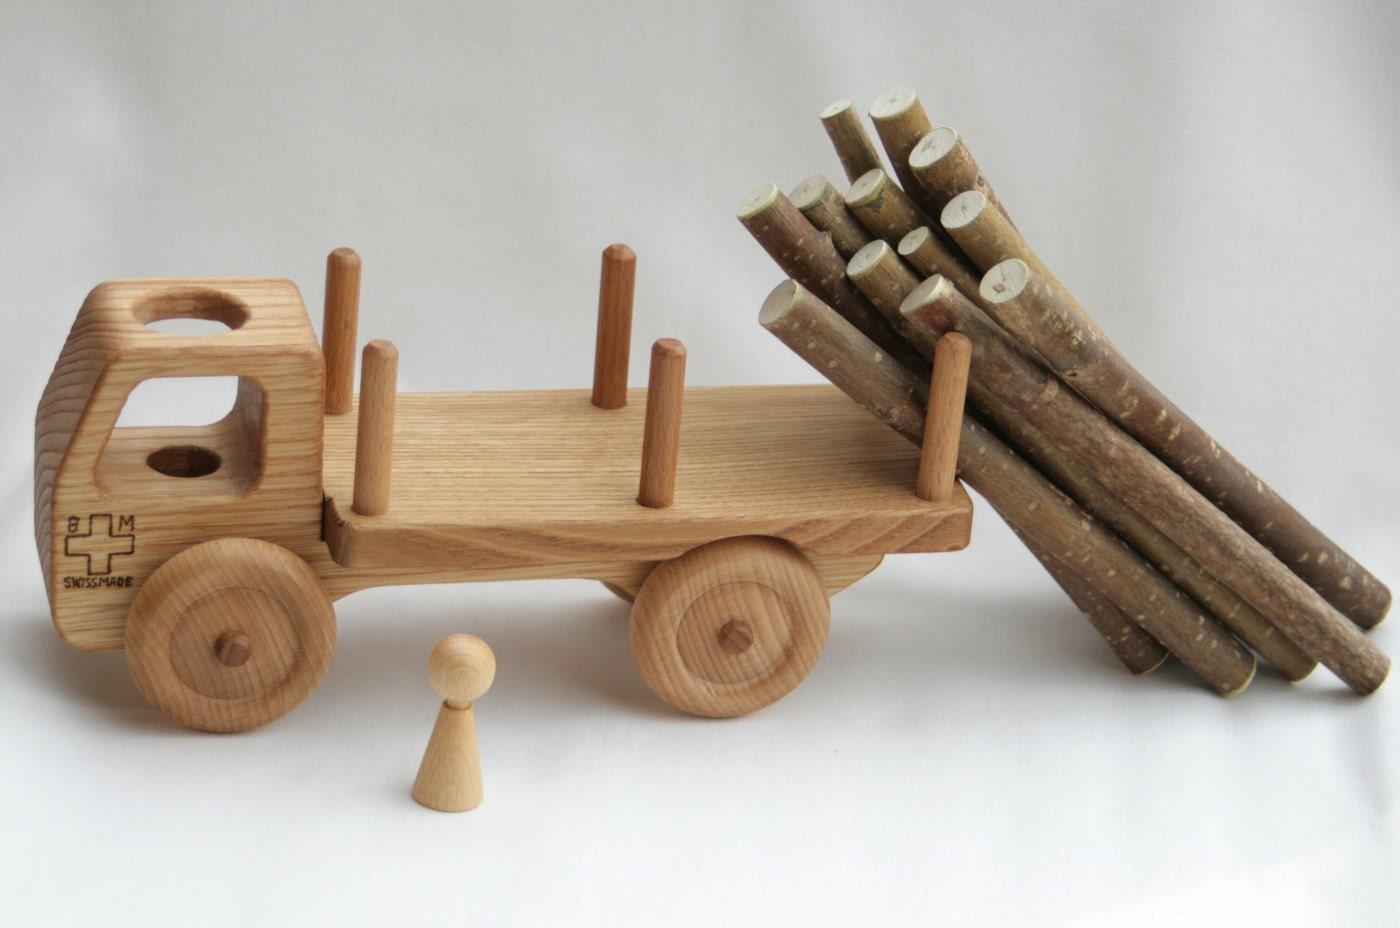 Wooden Toy Truck Wooden Car Waldorf toy Solid Chestnut